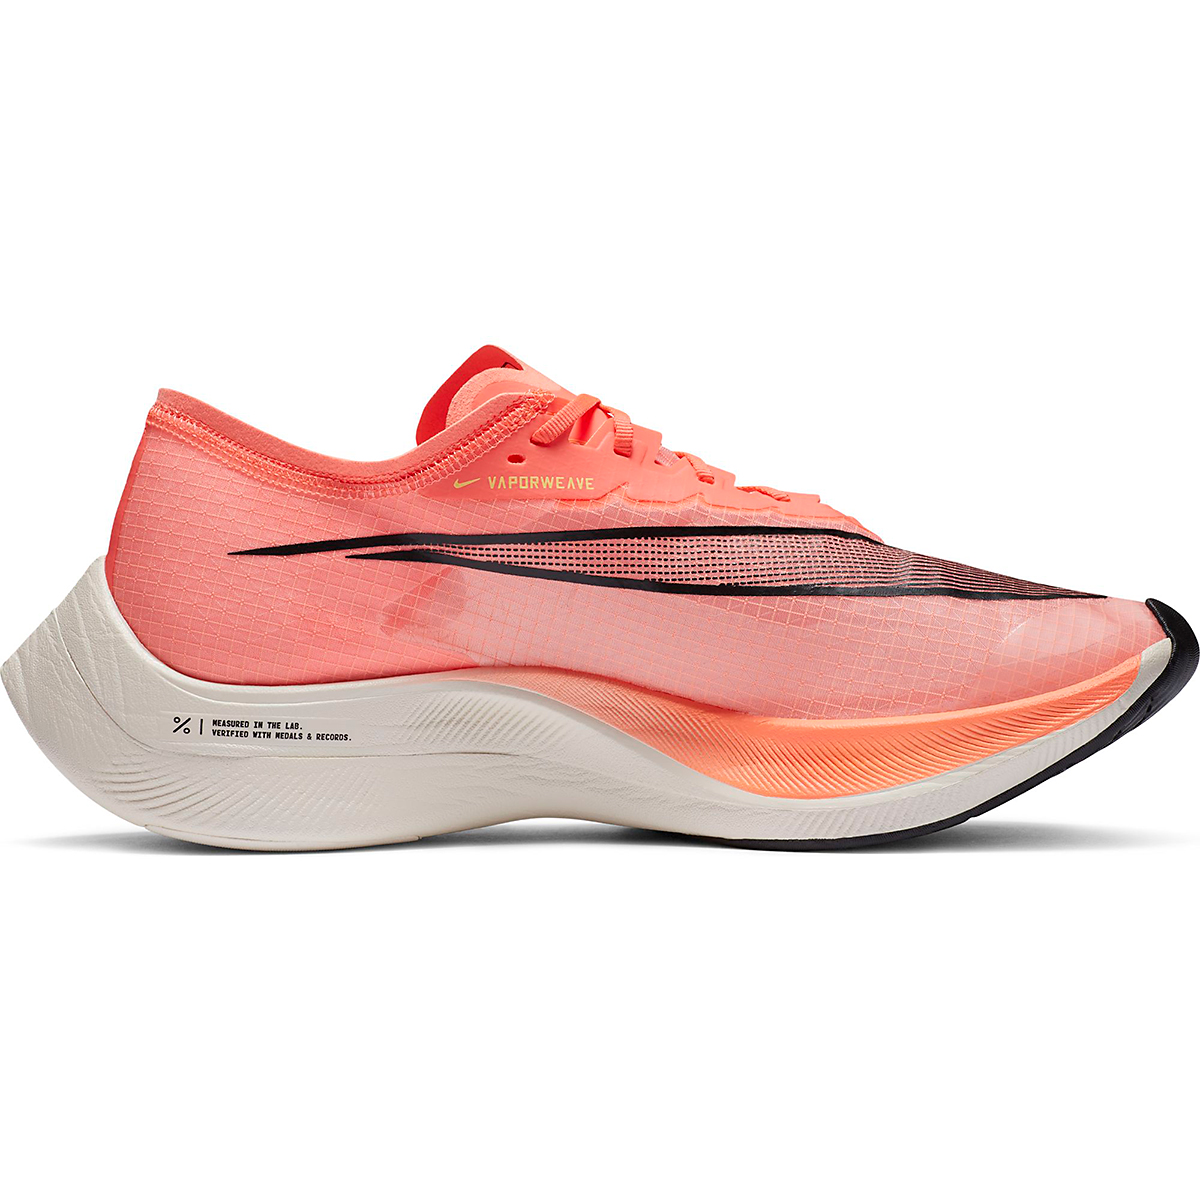 Nike ZoomX Vaporfly NEXT% Running Shoe - Color: Bright Mango/Citron Pulse - Size: M3.5/W5 - Width: Regular, Bright Mango/Citron Pulse, large, image 1